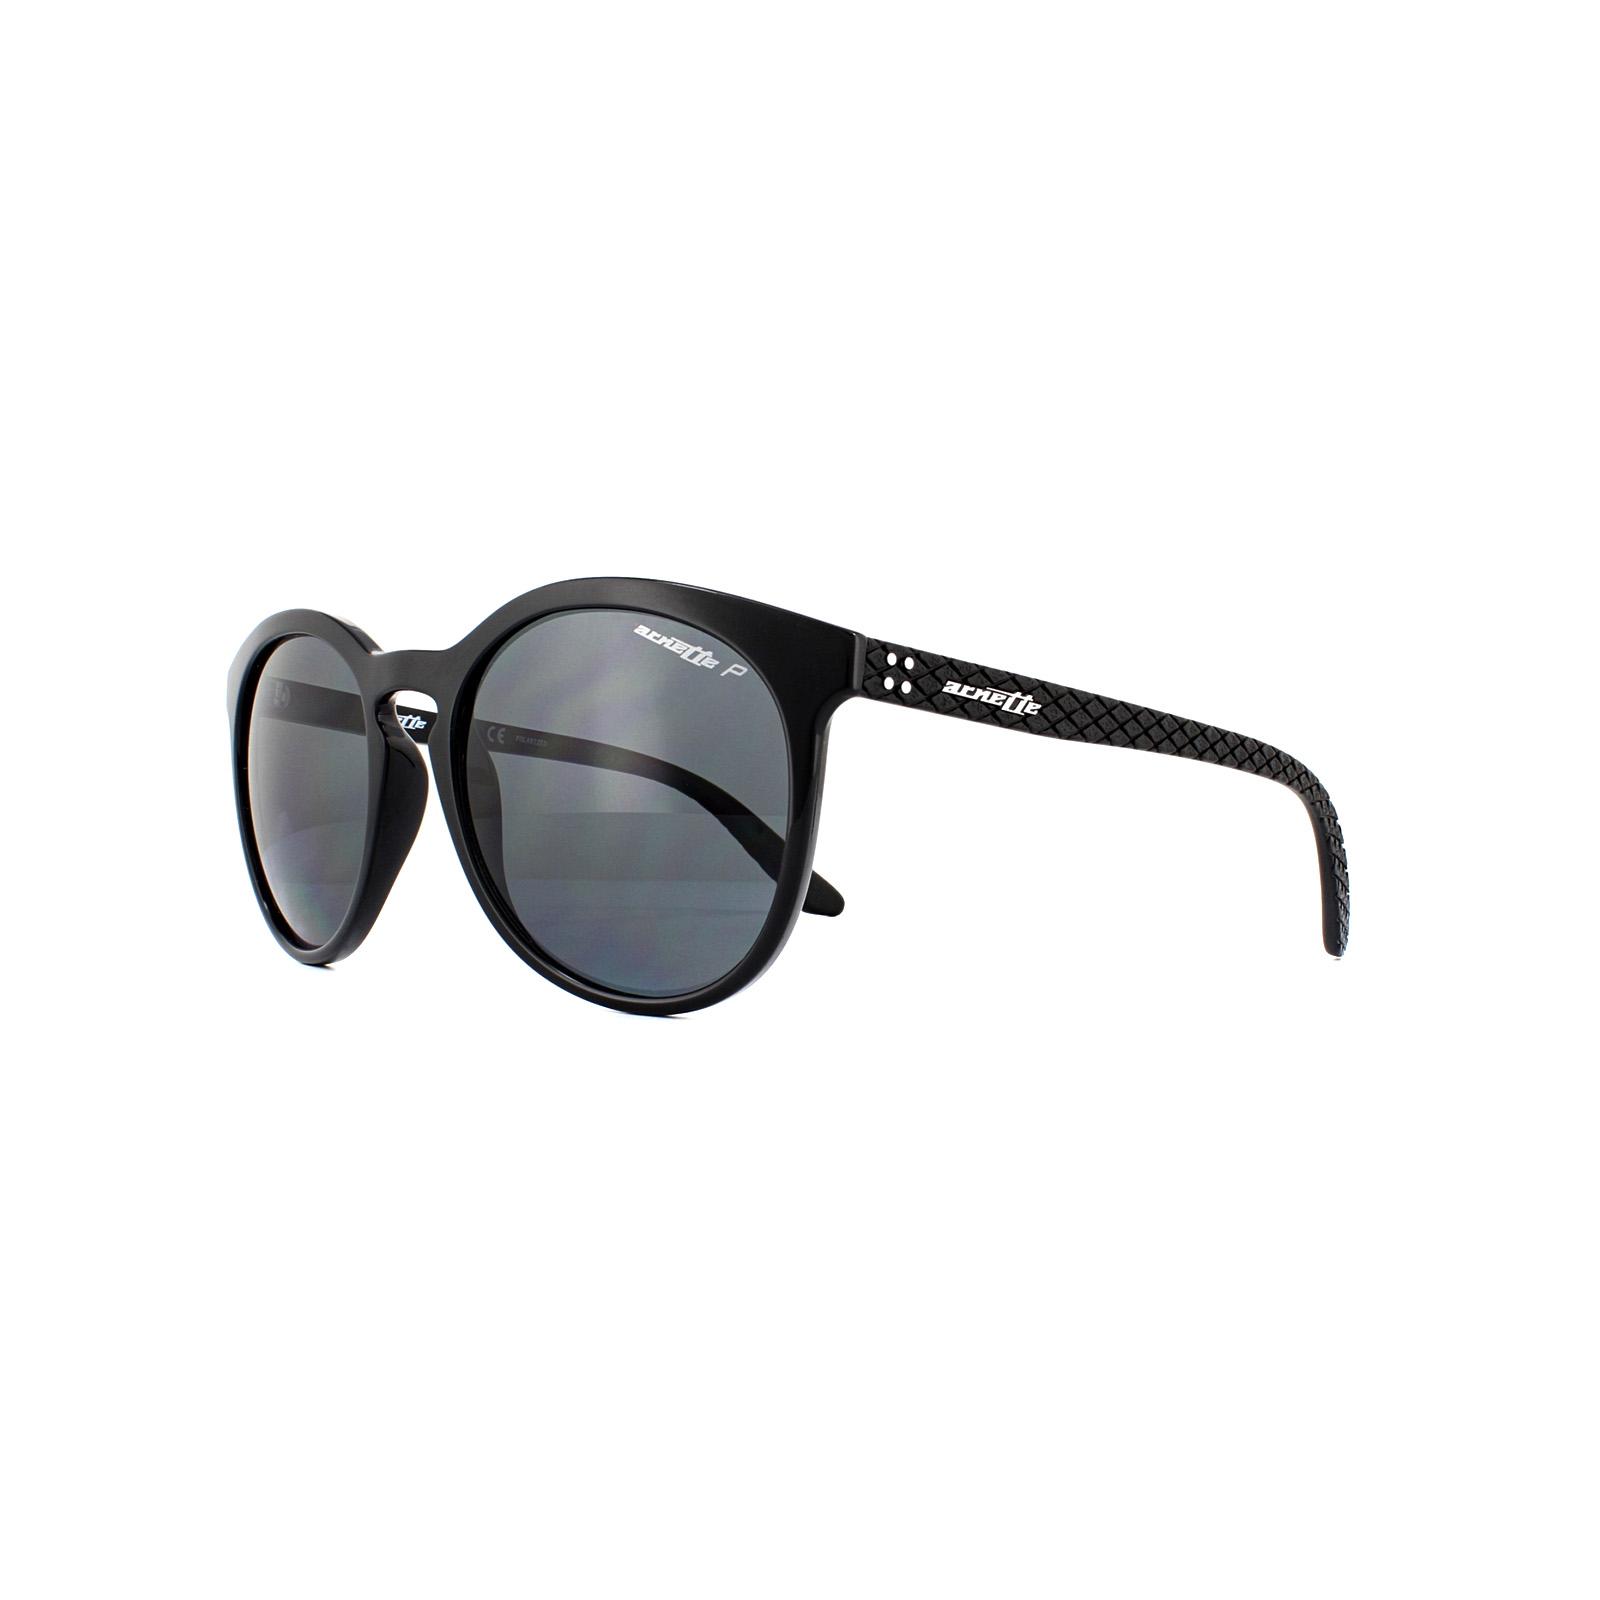 44b09a5b350 Sentinel Arnette Sunglasses Chenga R 4241 41 81 Matte Black Grey Polarized